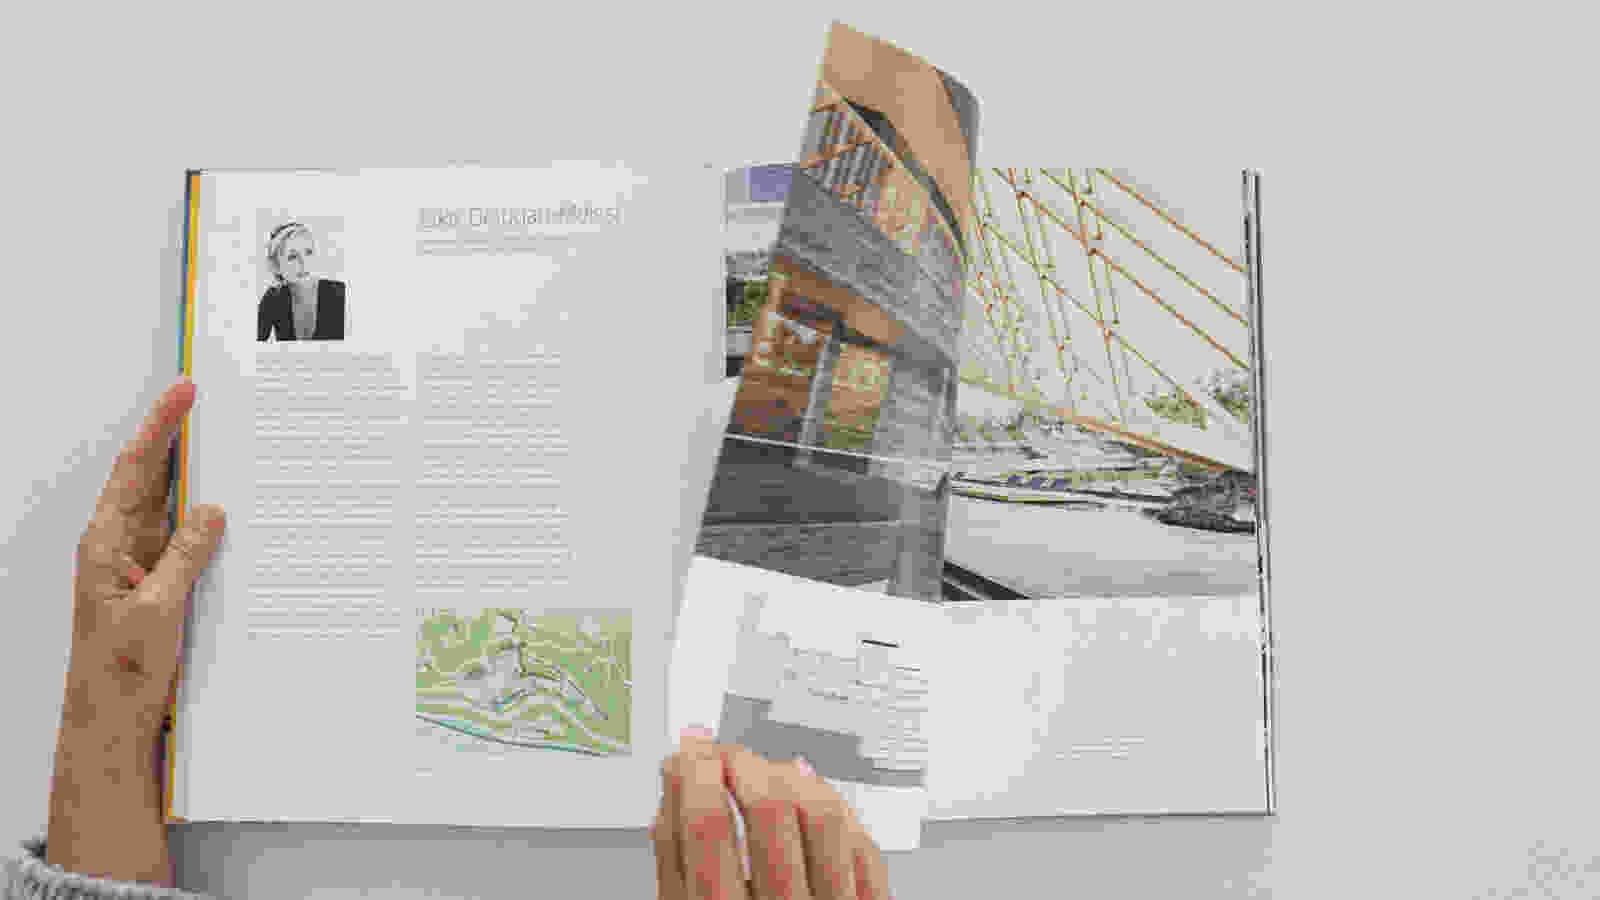 Women in architecture hatje cantz EDM 002 02